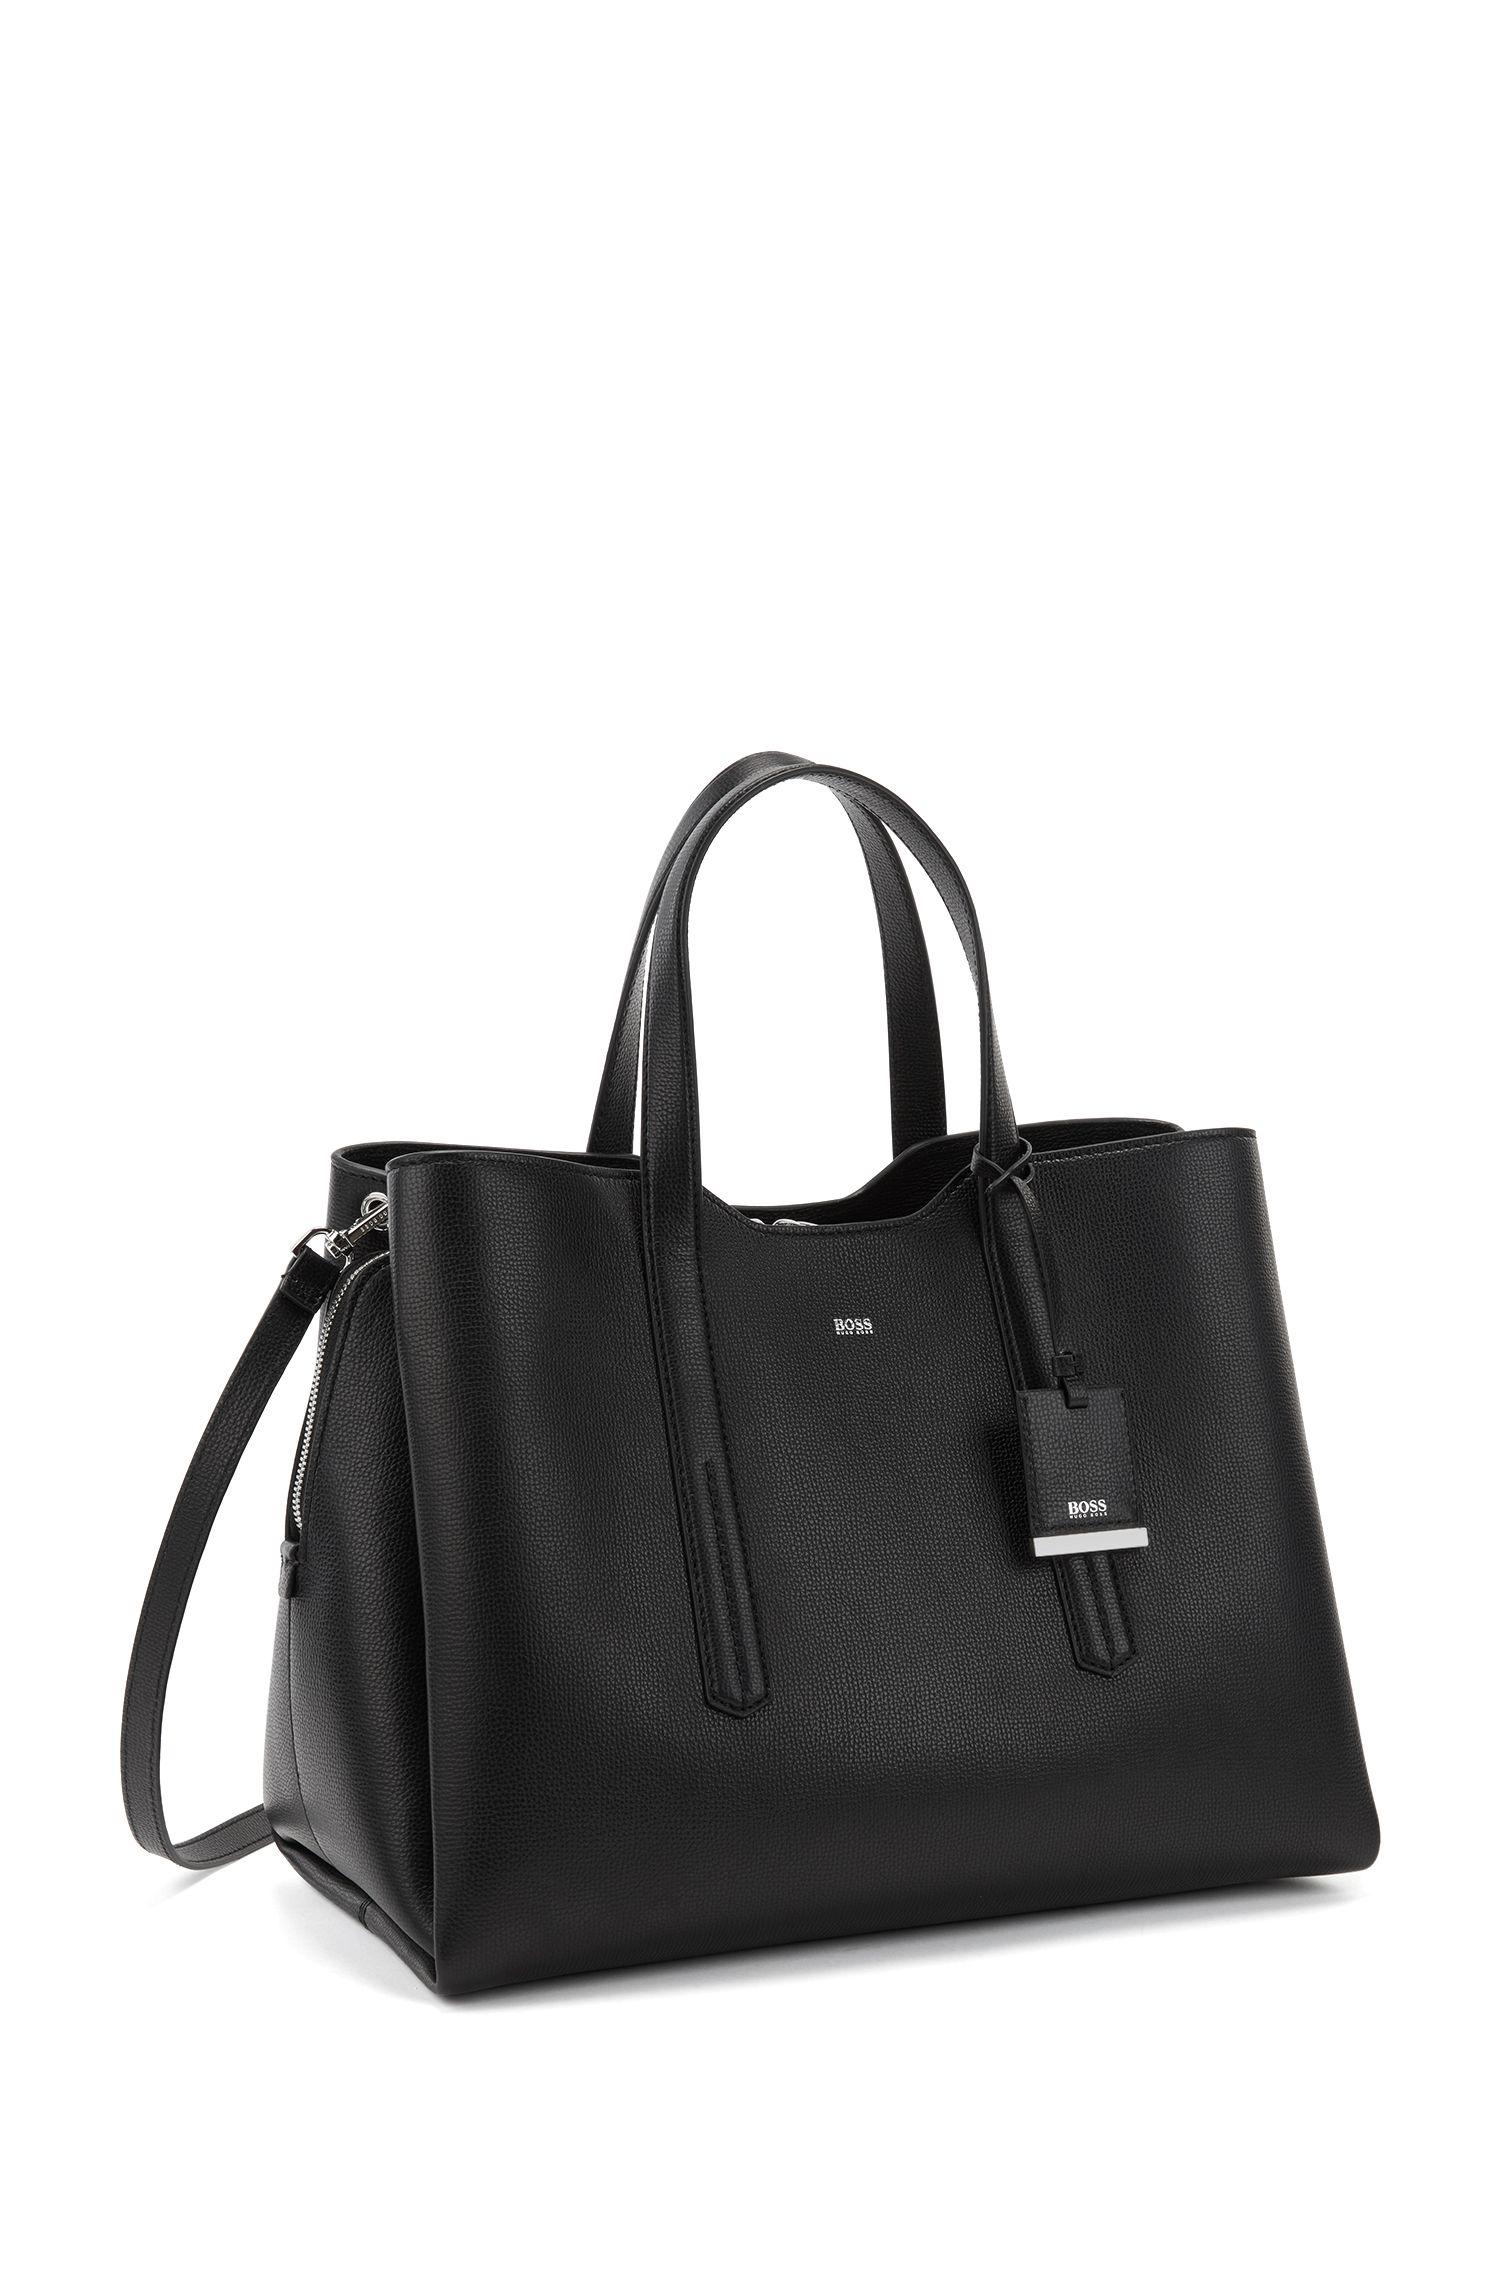 Soft tote bag in grainy Italian leather, Black